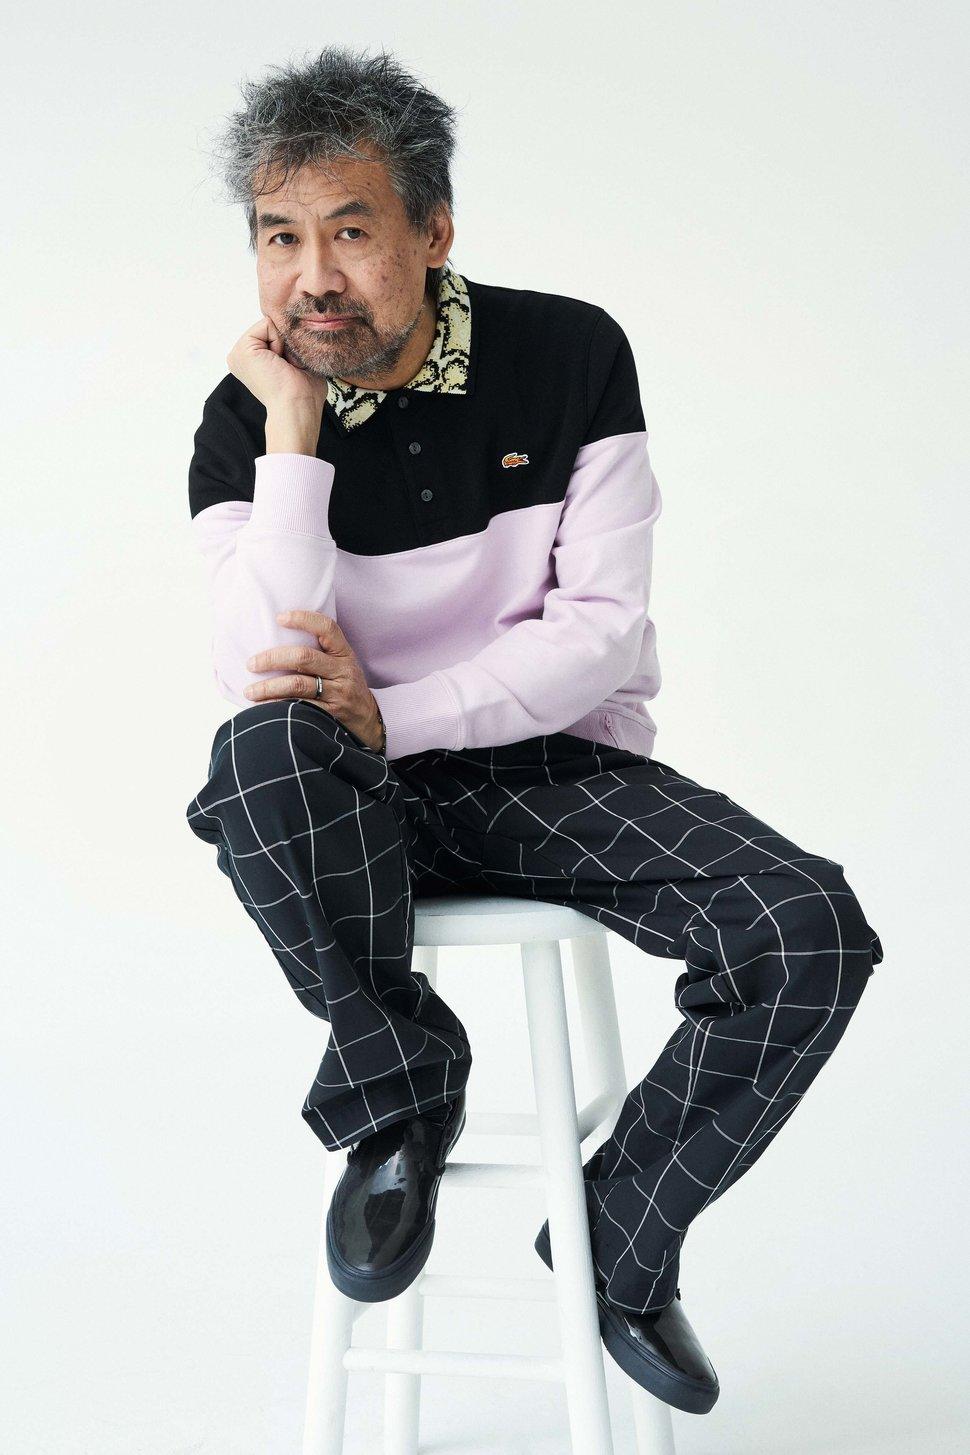 David Henry Hwang (playwright)